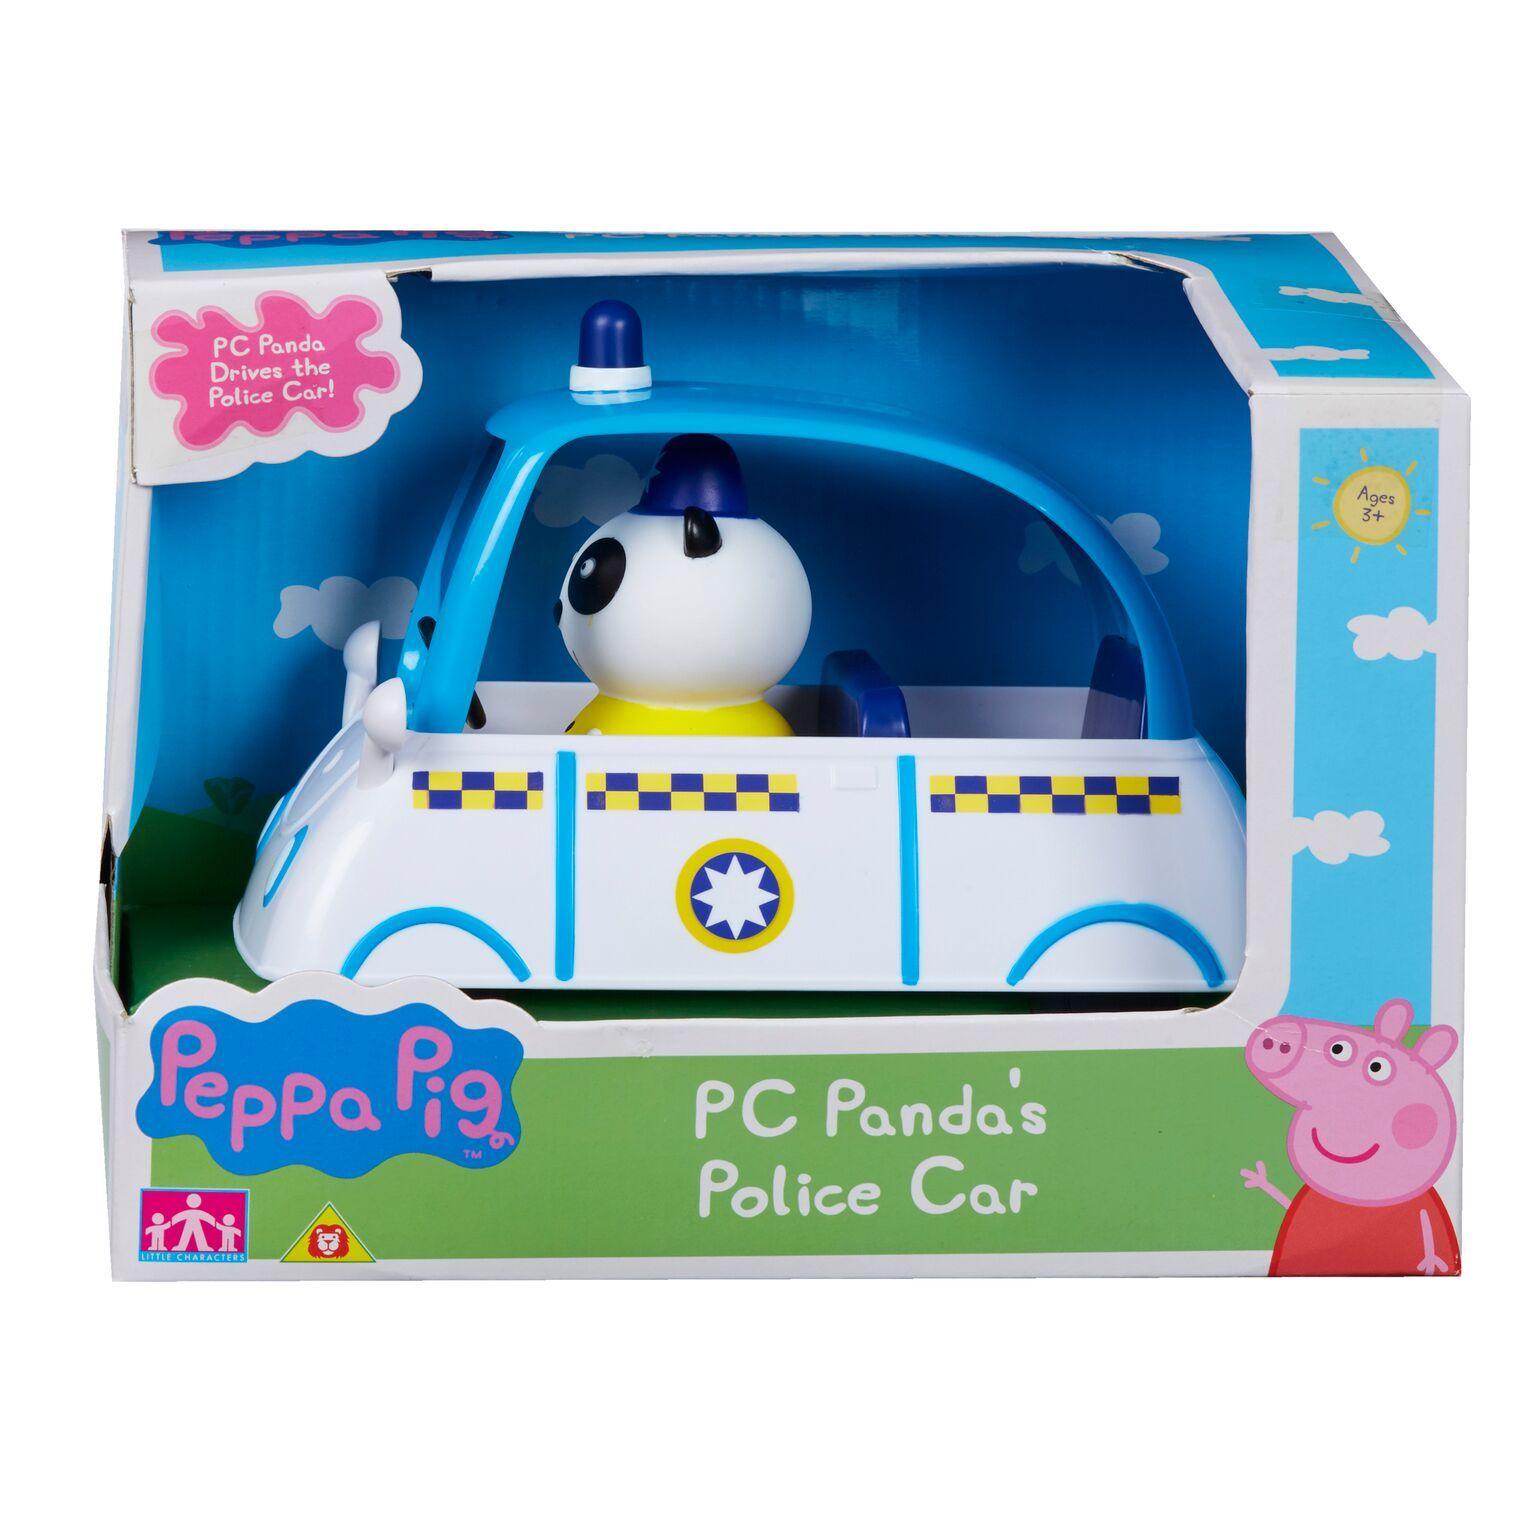 Peppa Pig: Vehicles - Police Car image